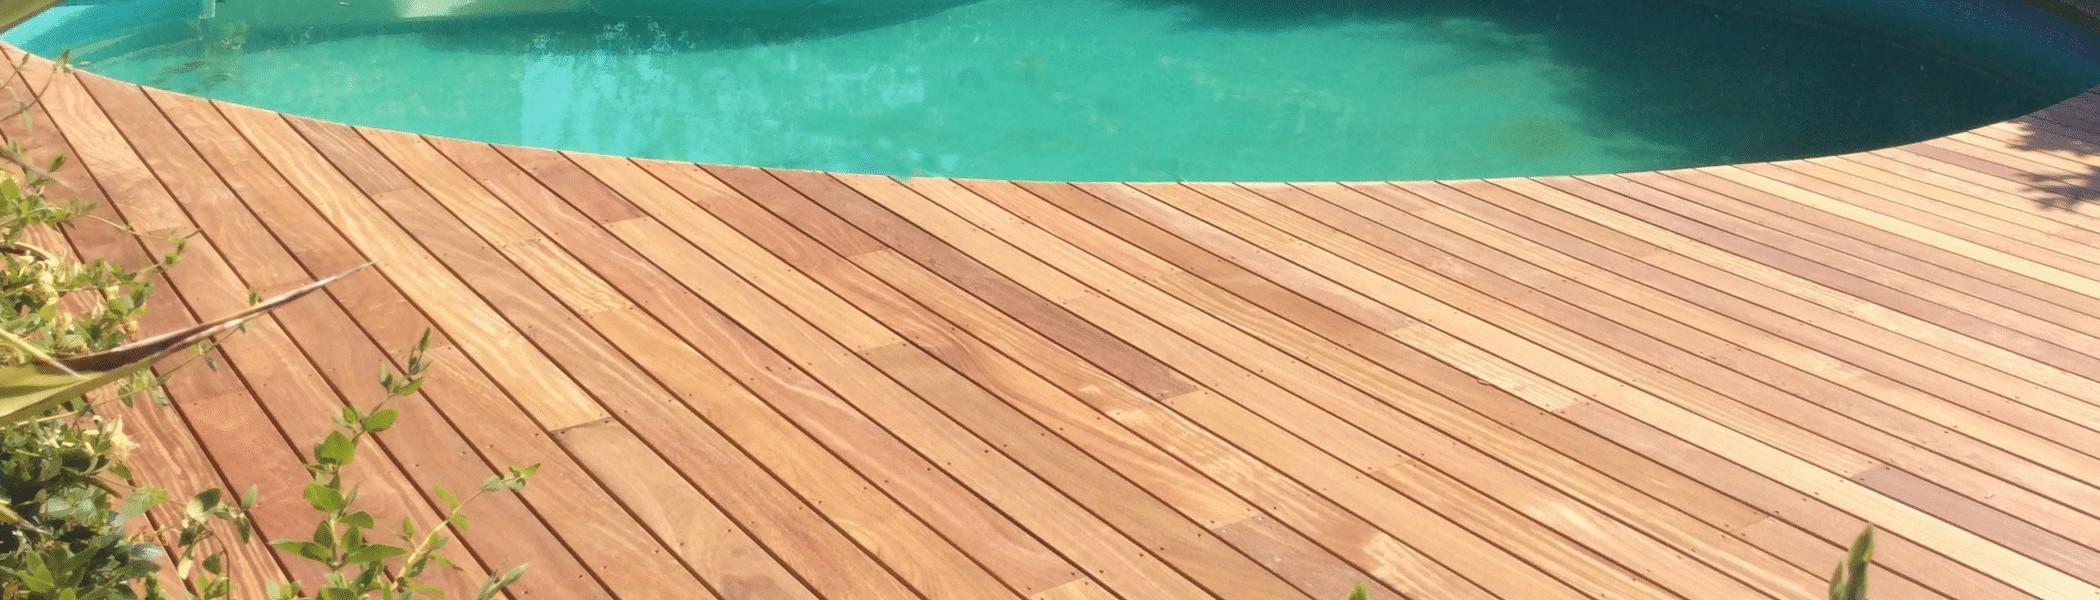 réalisation terrasse bois cumaru